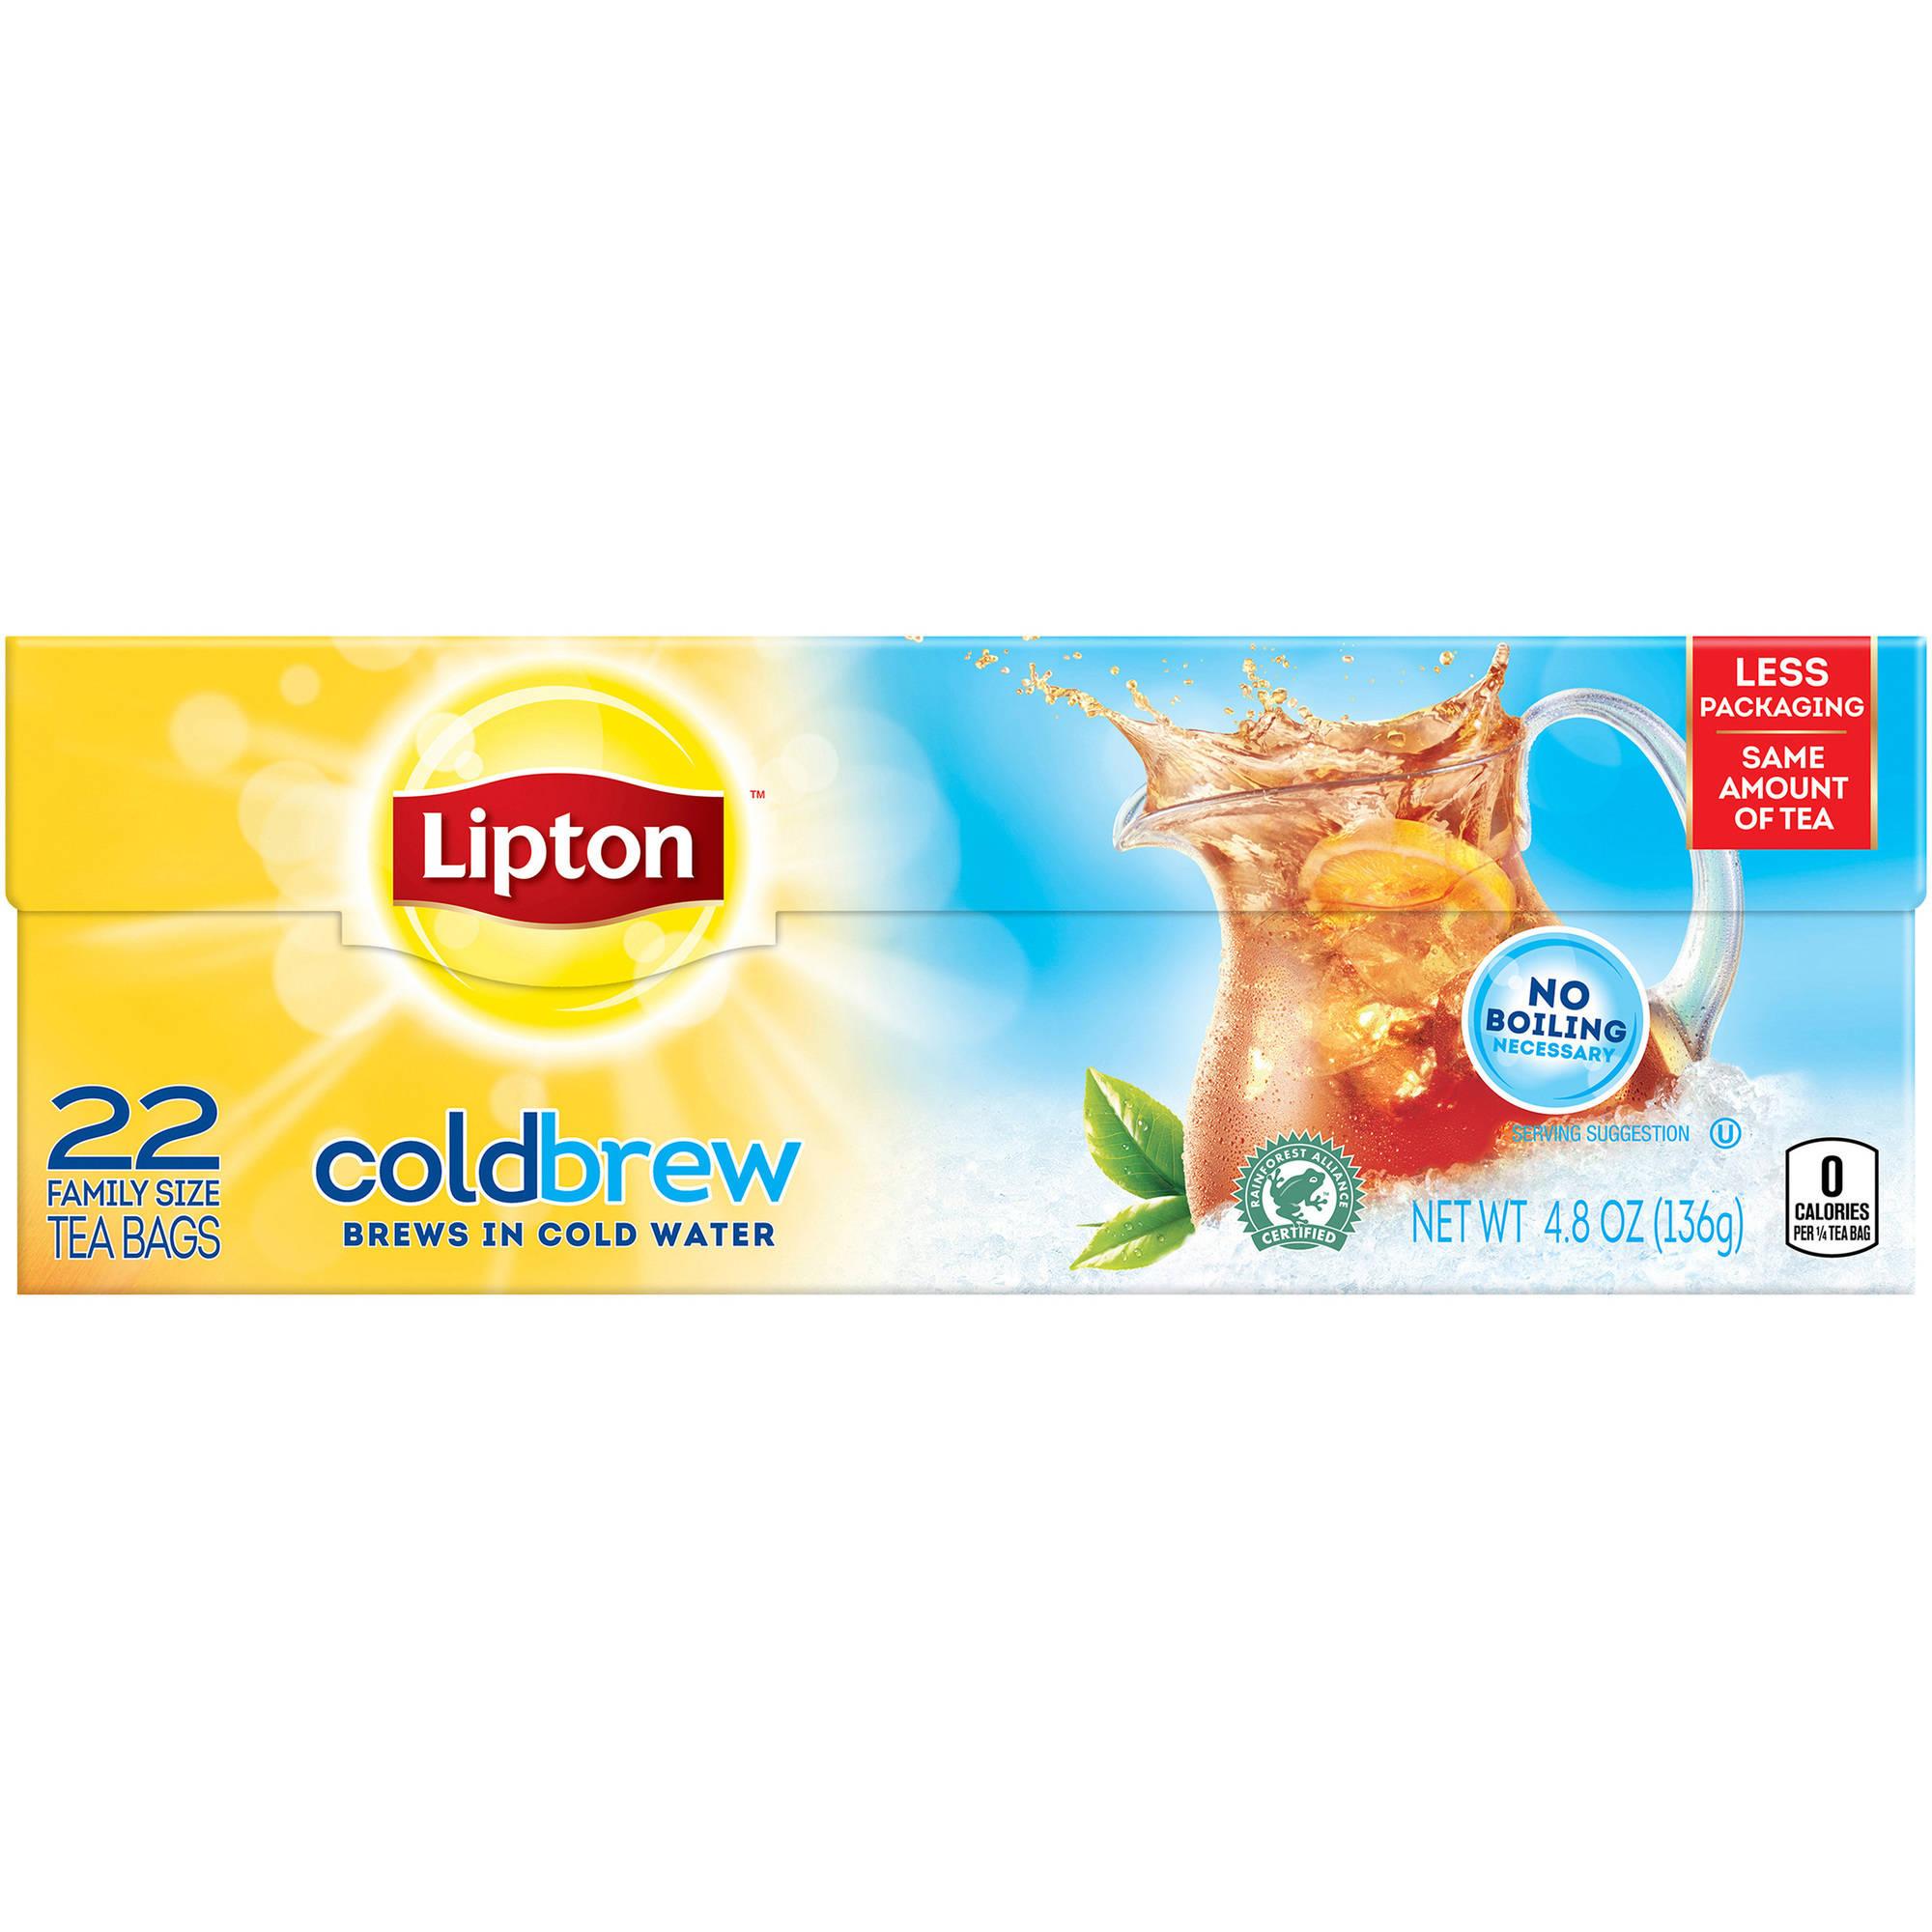 Lipton Cold Brew Family Size Black Iced Tea Bags, 22 ct